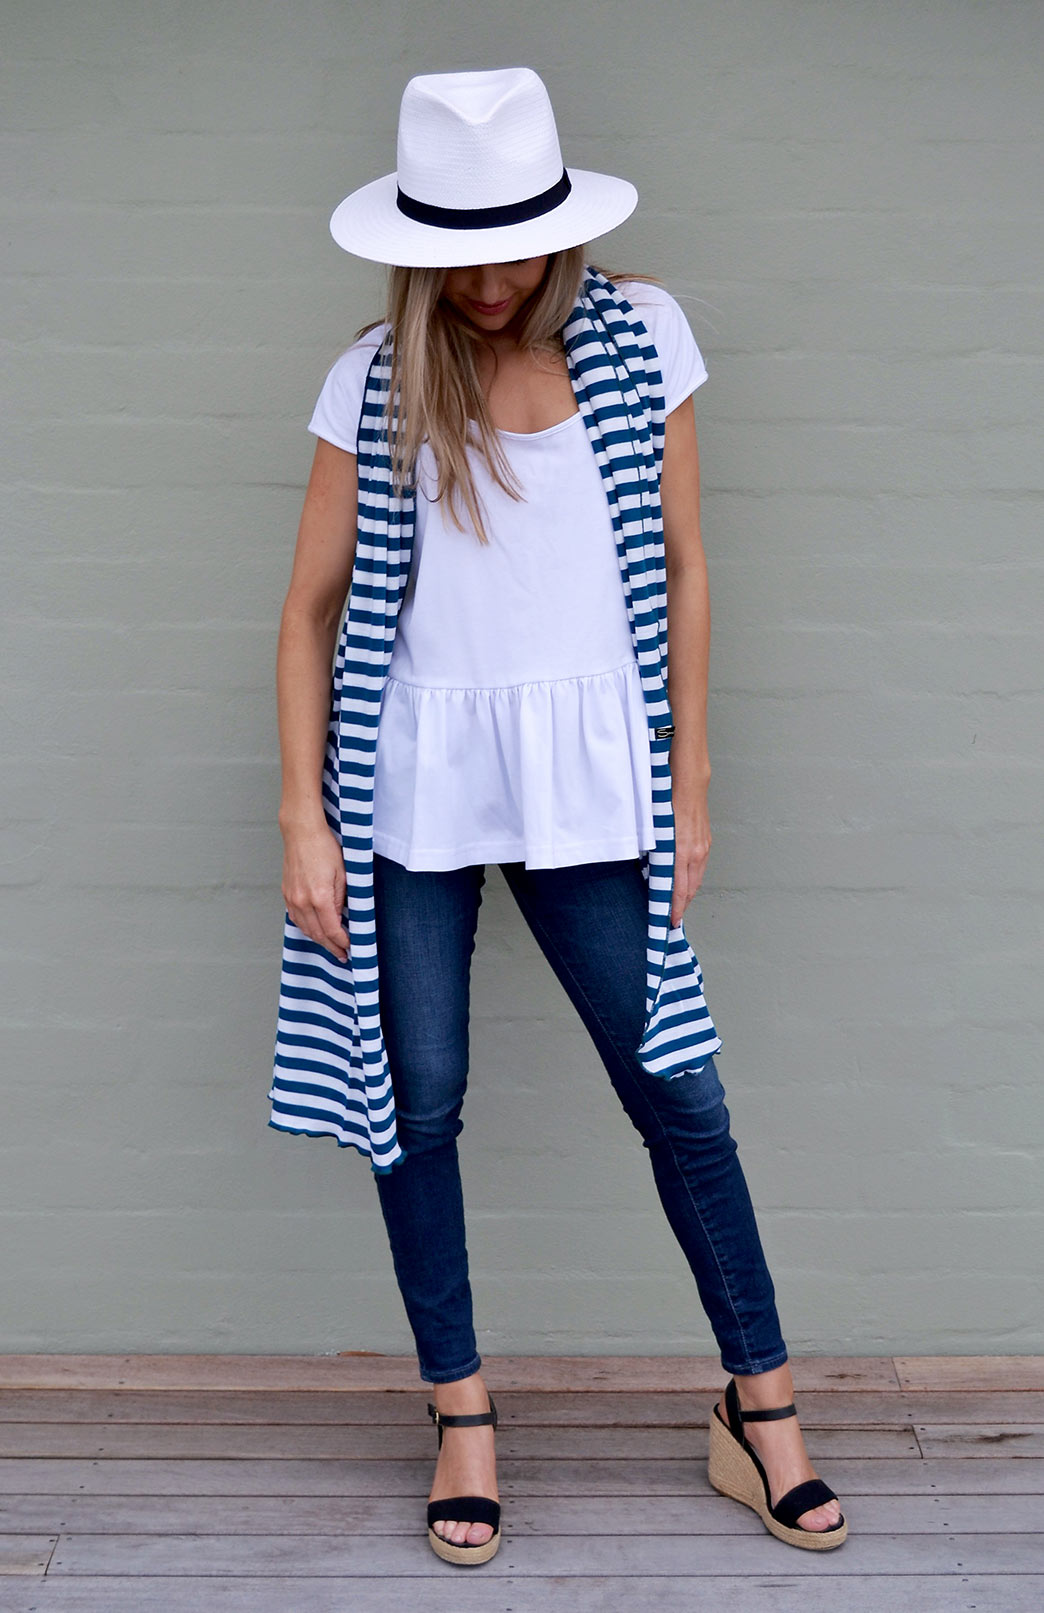 Merino Wool Scarf - Patterned - Women's Superfine Merino Wool Classic Wide Scarf - Smitten Merino Tasmania Australia